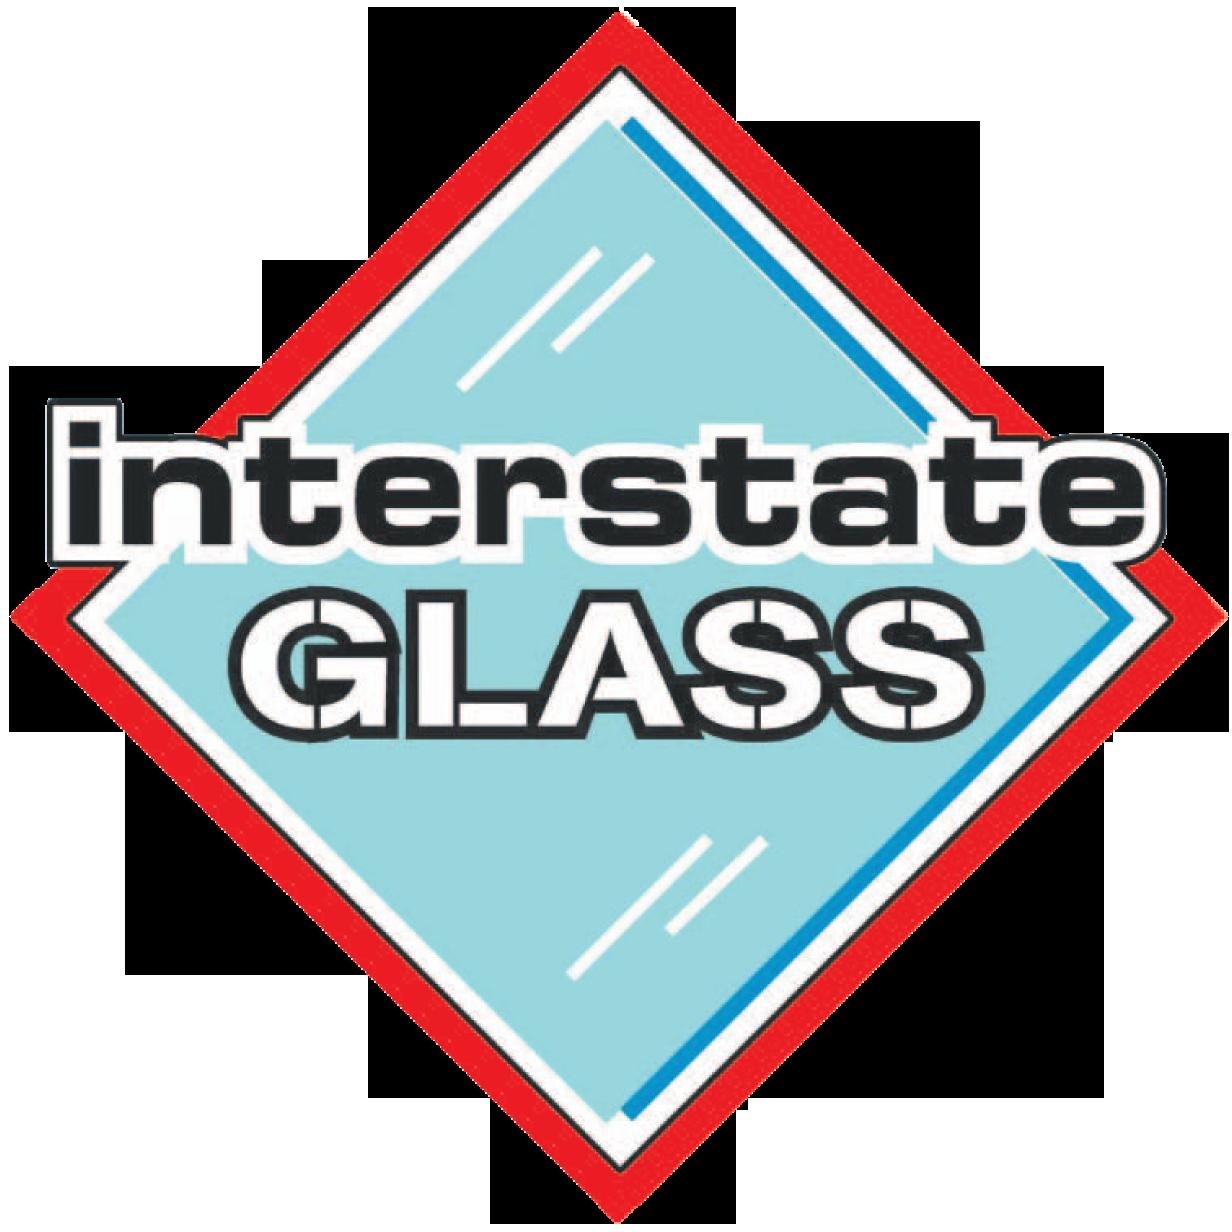 Interstate Glass image 8